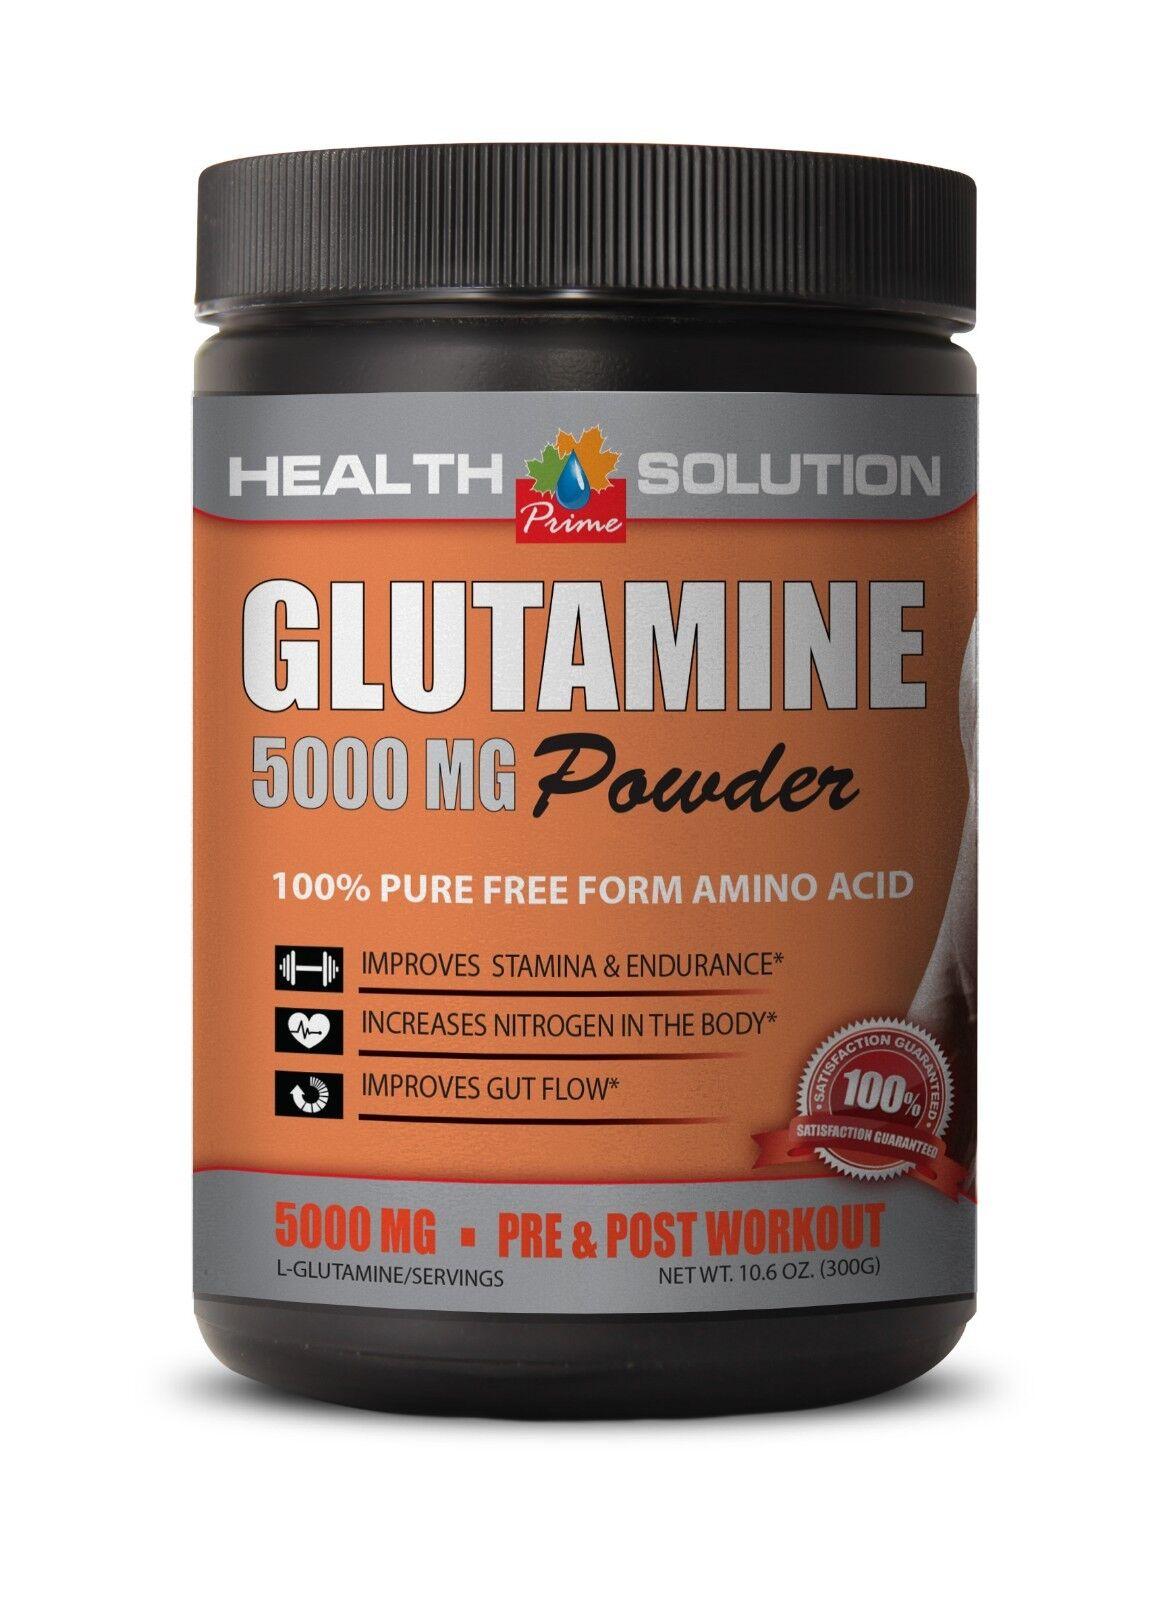 glutamine powder - GLUTAMINE POWDER 5000mg - muscle growth s